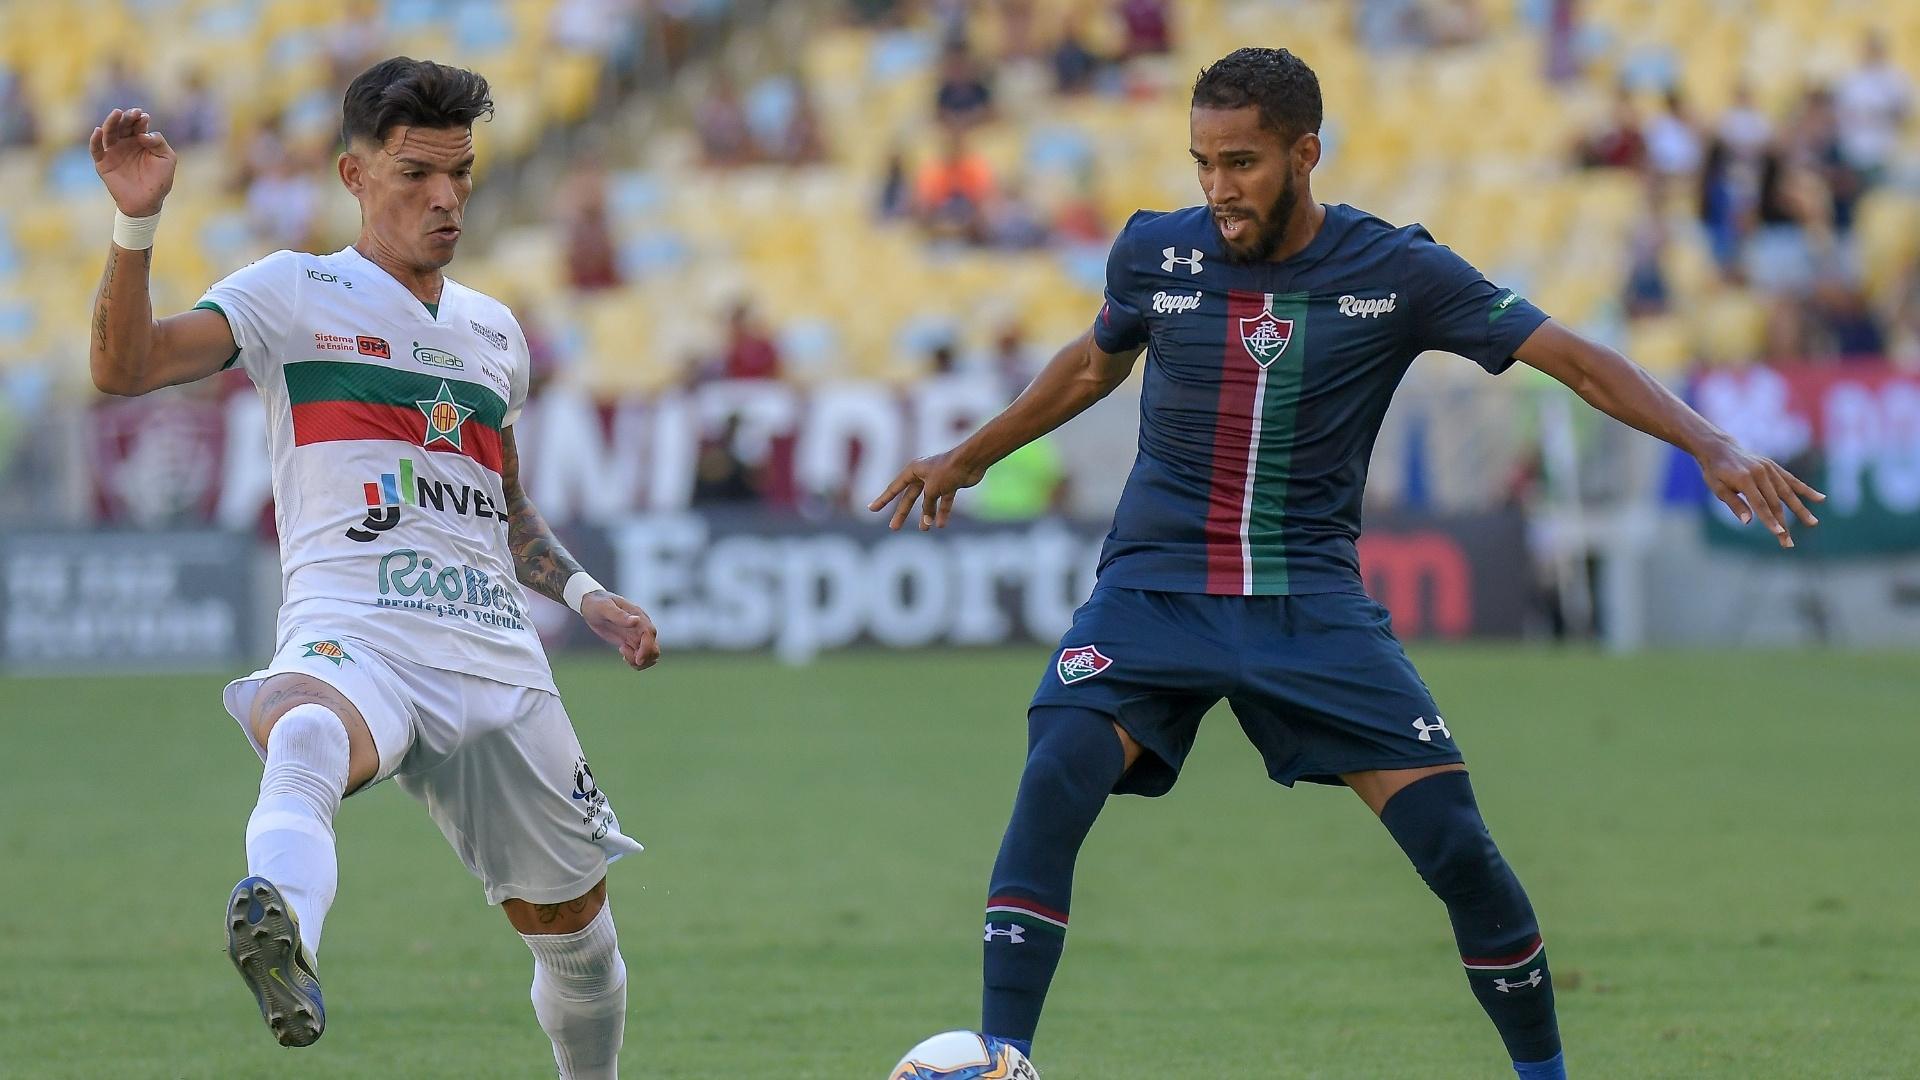 Jogadores de Fluminense e Portuguesa-RJ disputam a bola